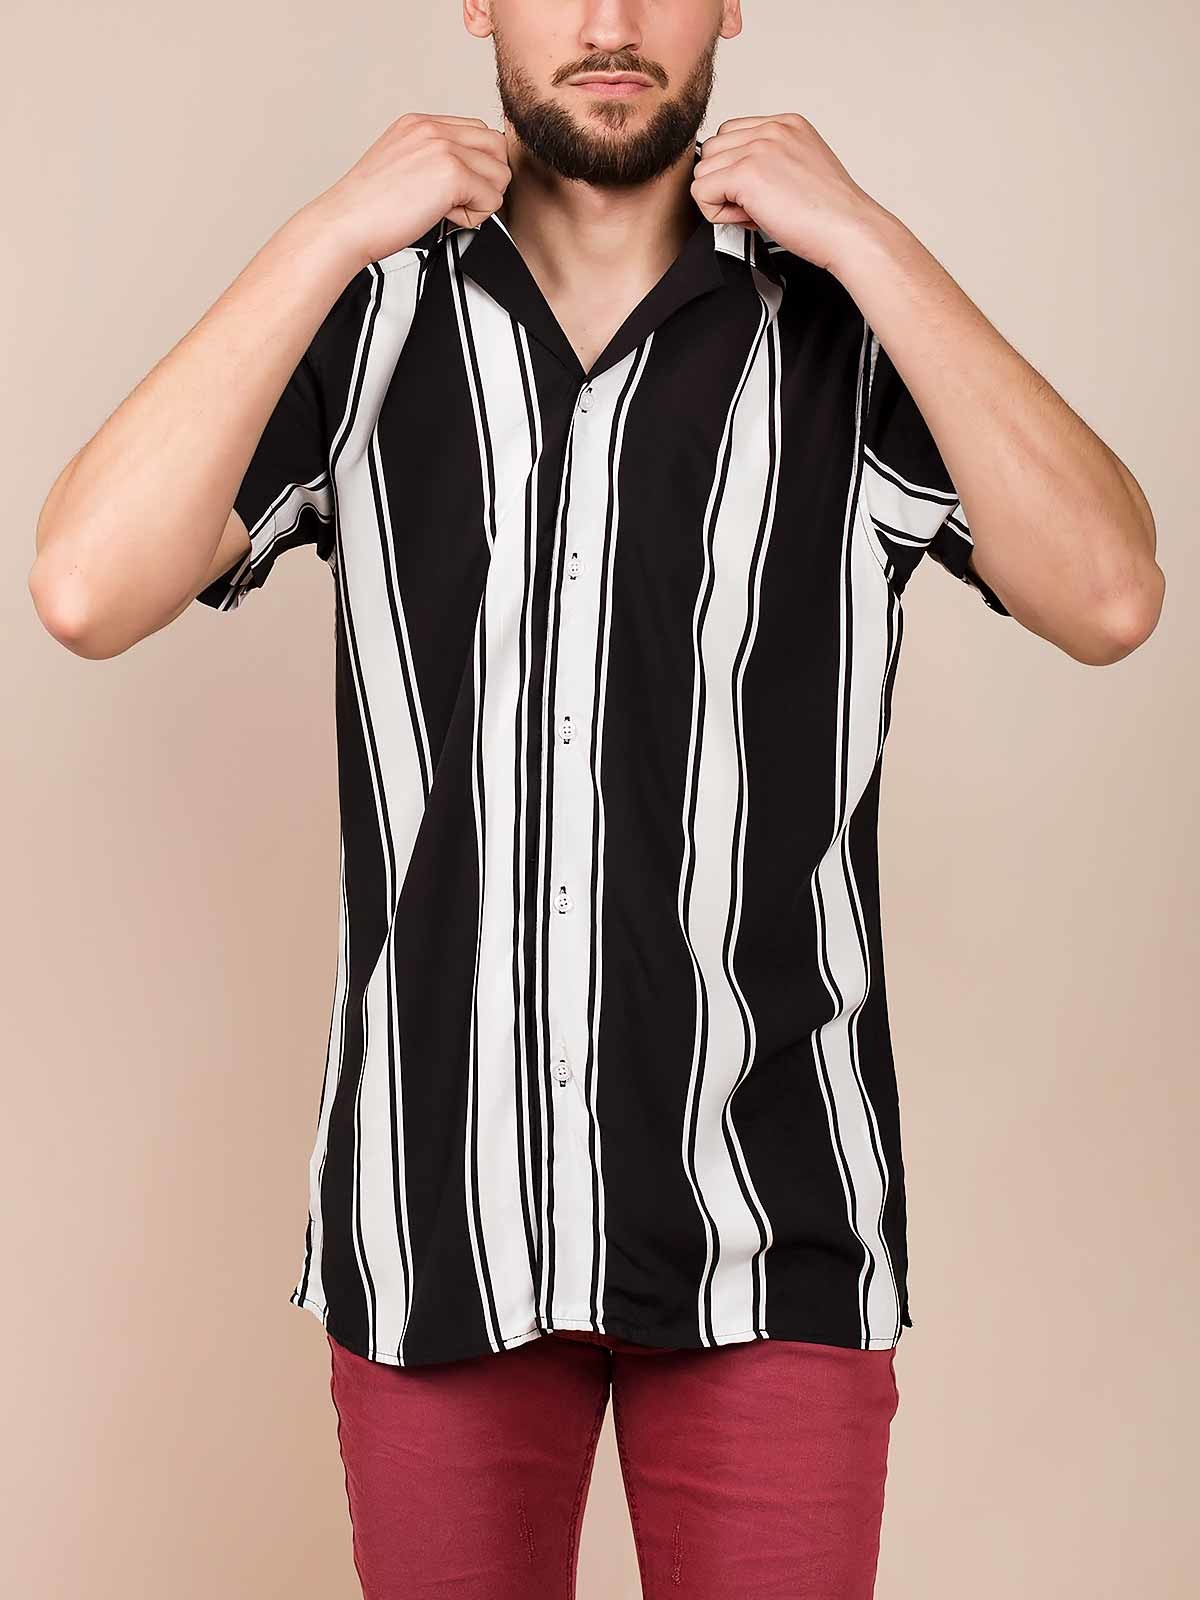 Camisa riscas preto e branco